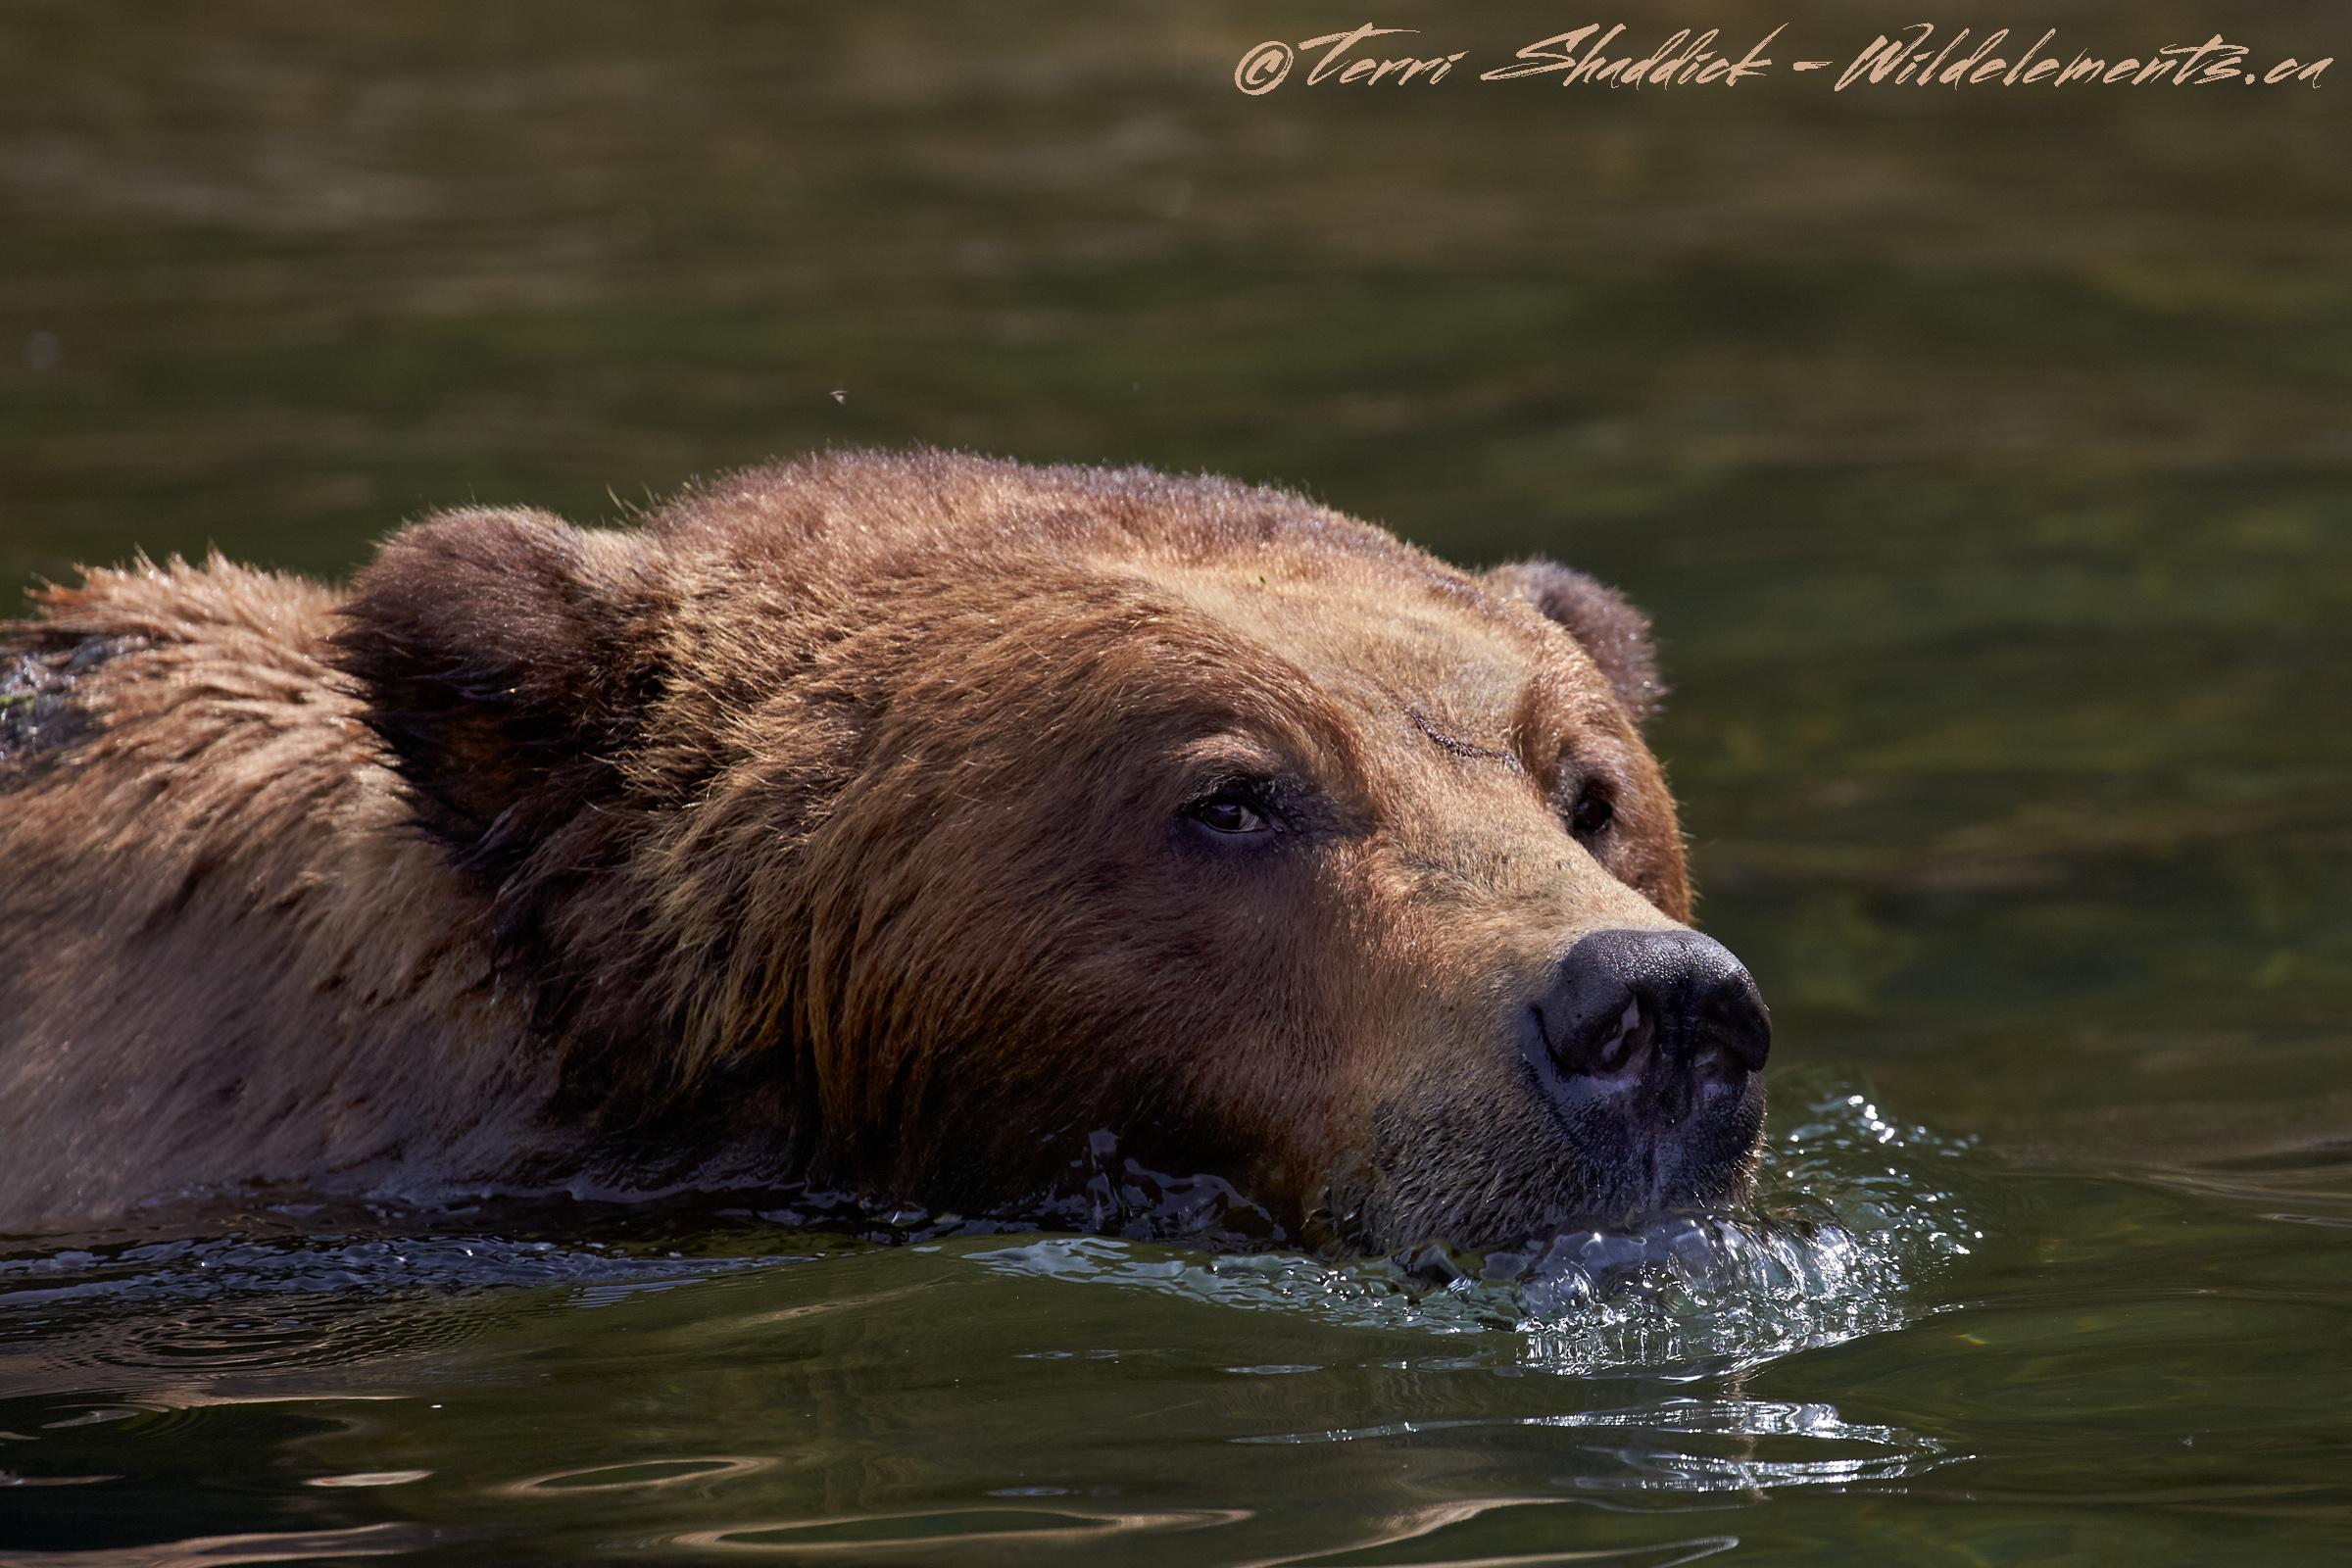 Grizzly Bear Swimming in Khutzeymateen British Columbia